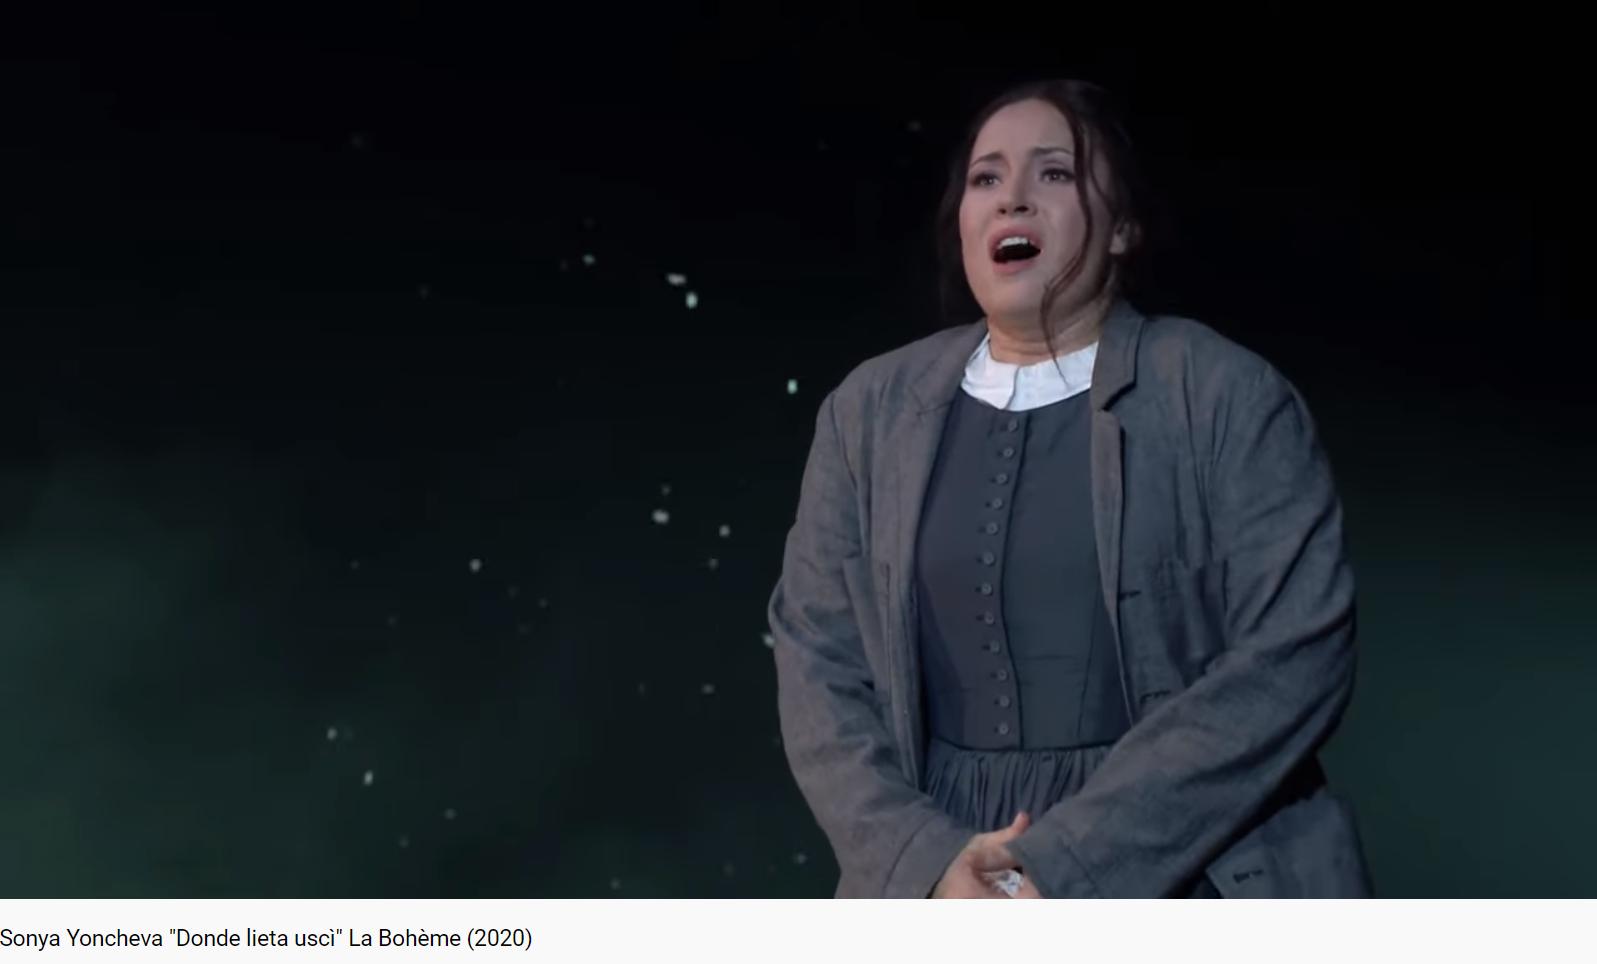 Puccini La Bohème Donde lieta usci